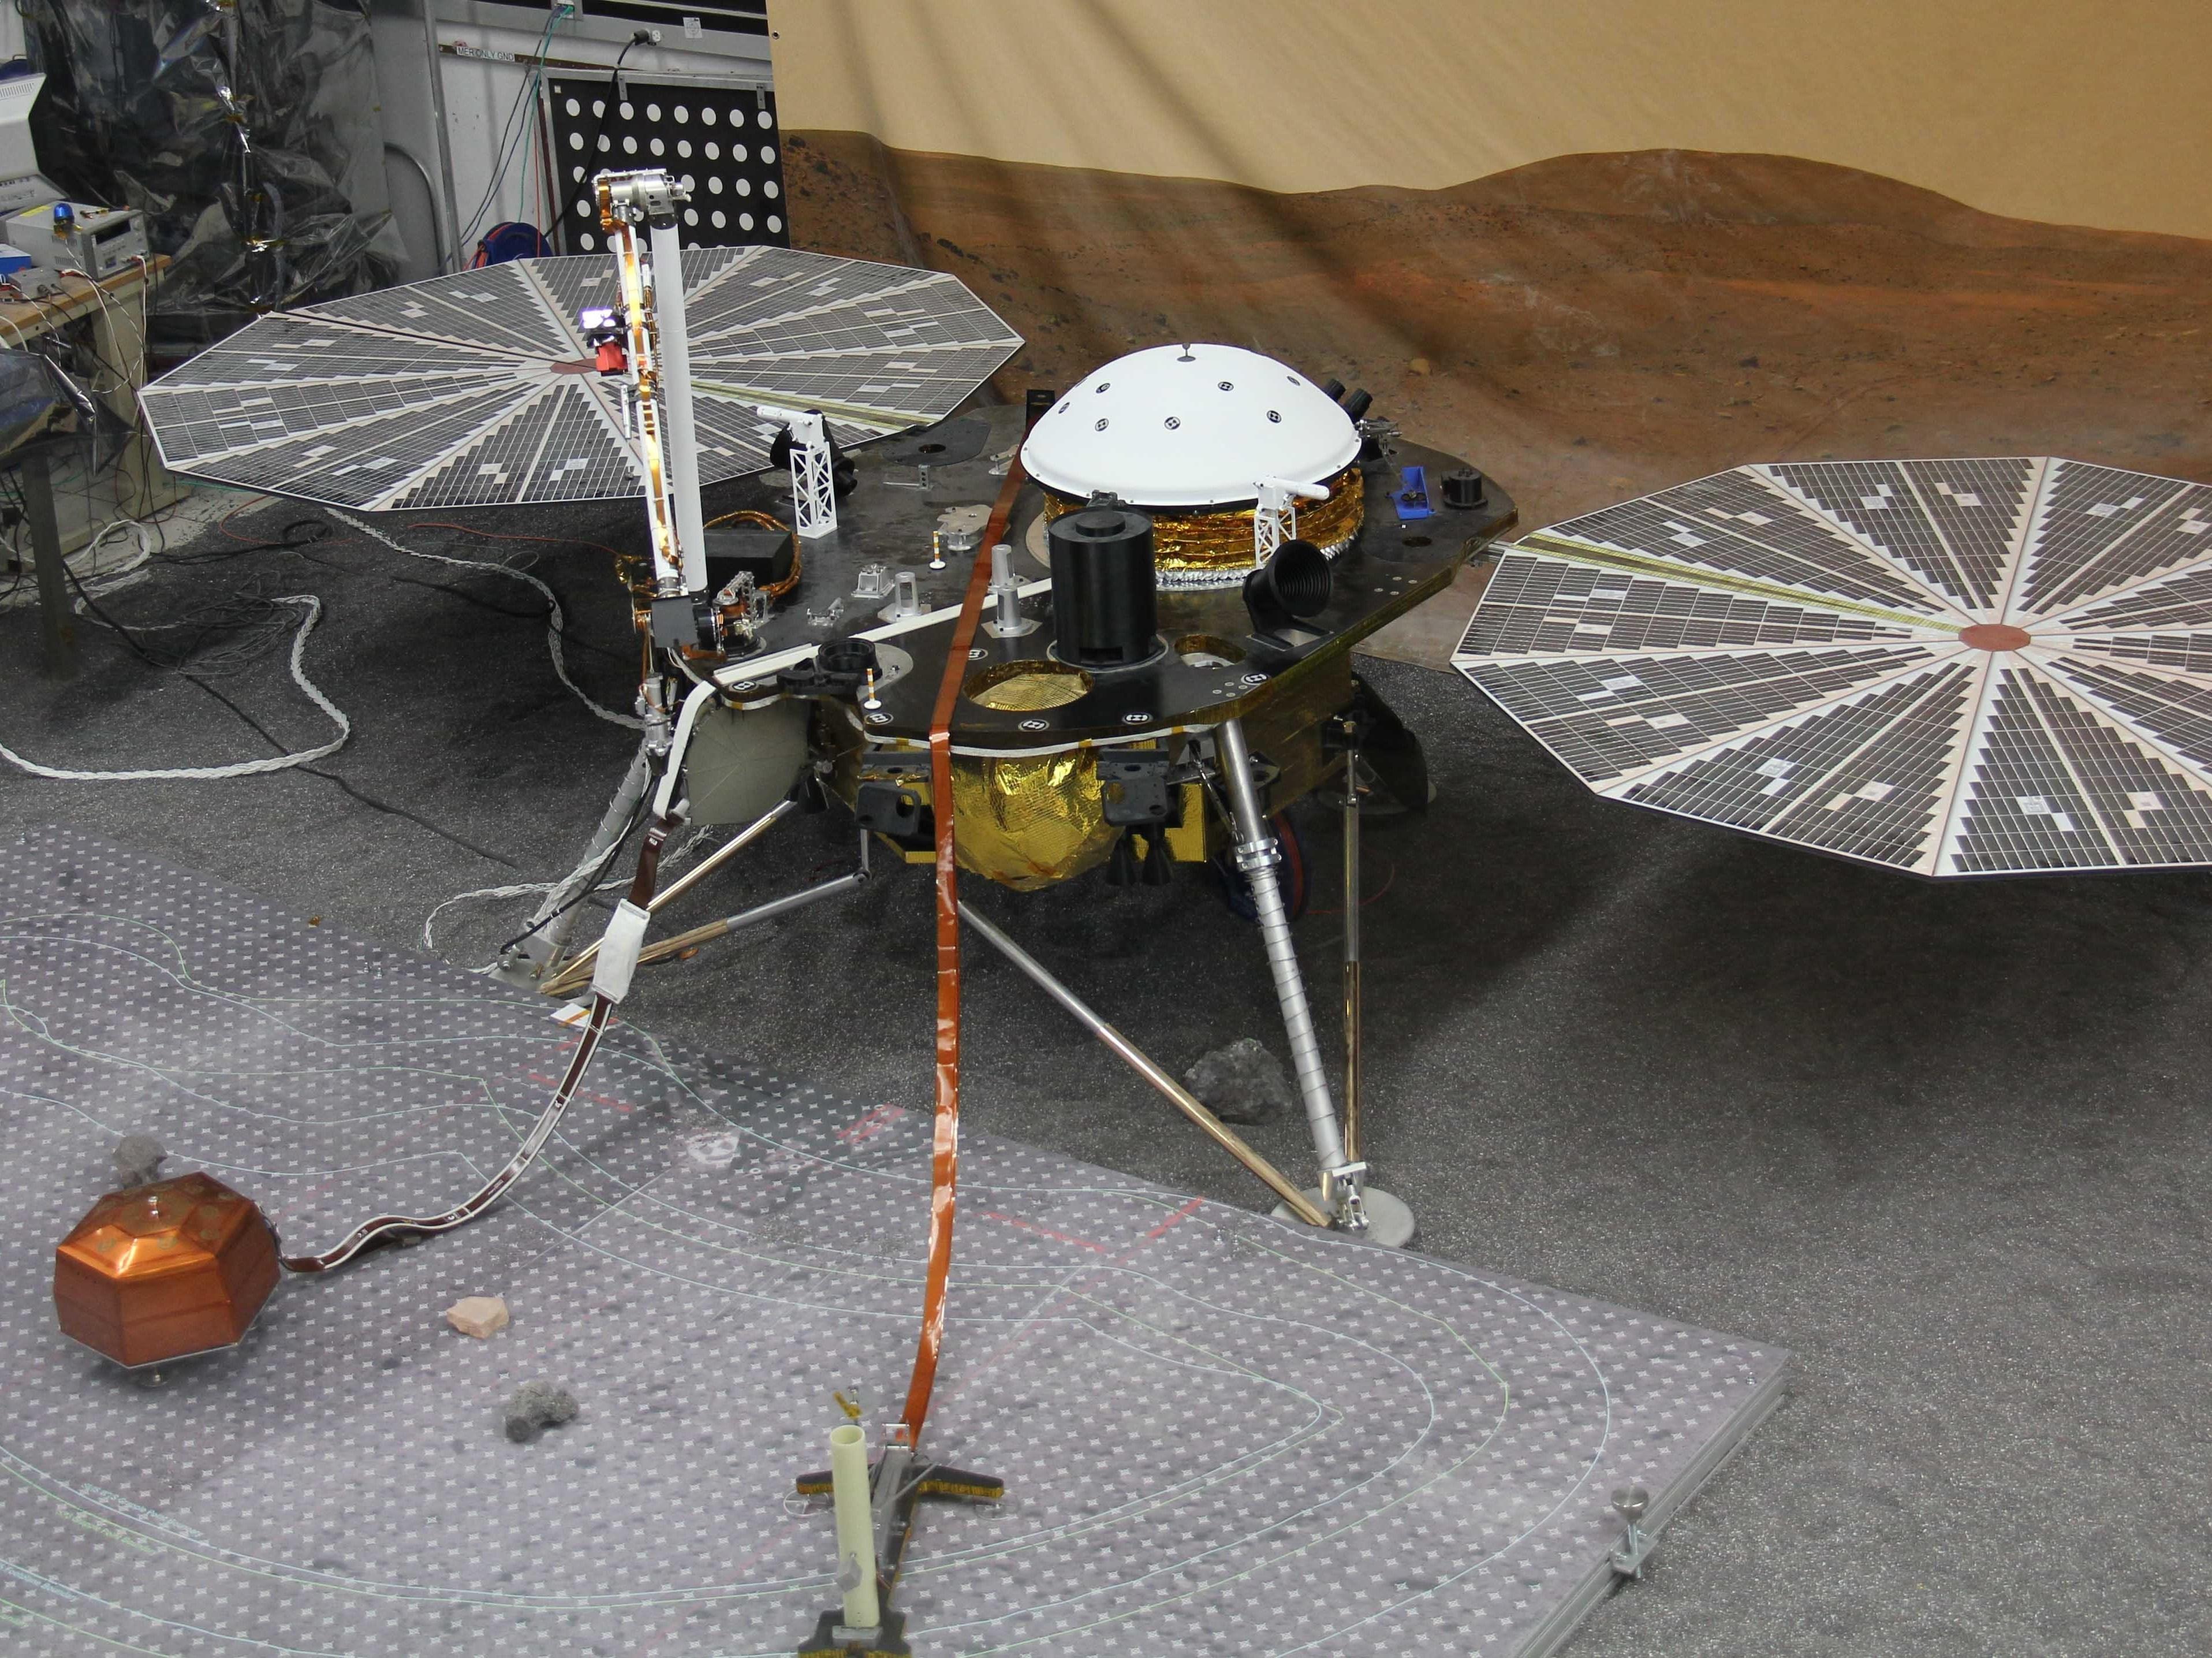 insight mars rover live stream - photo #21